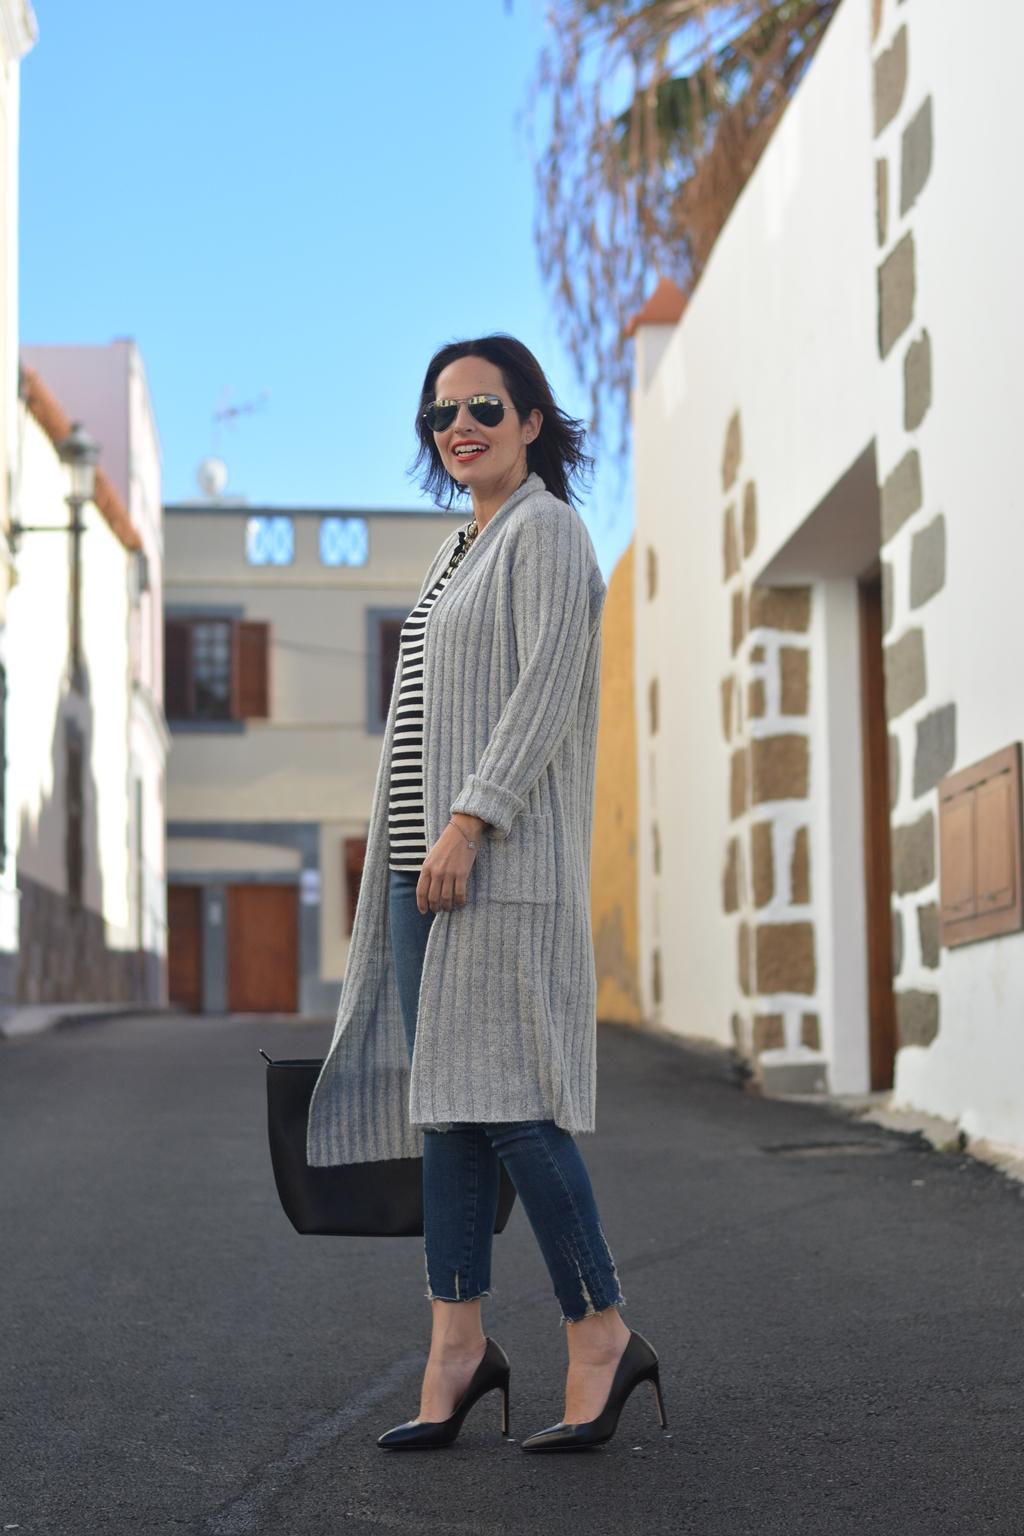 zara-black-heels-outfit-daily-looks